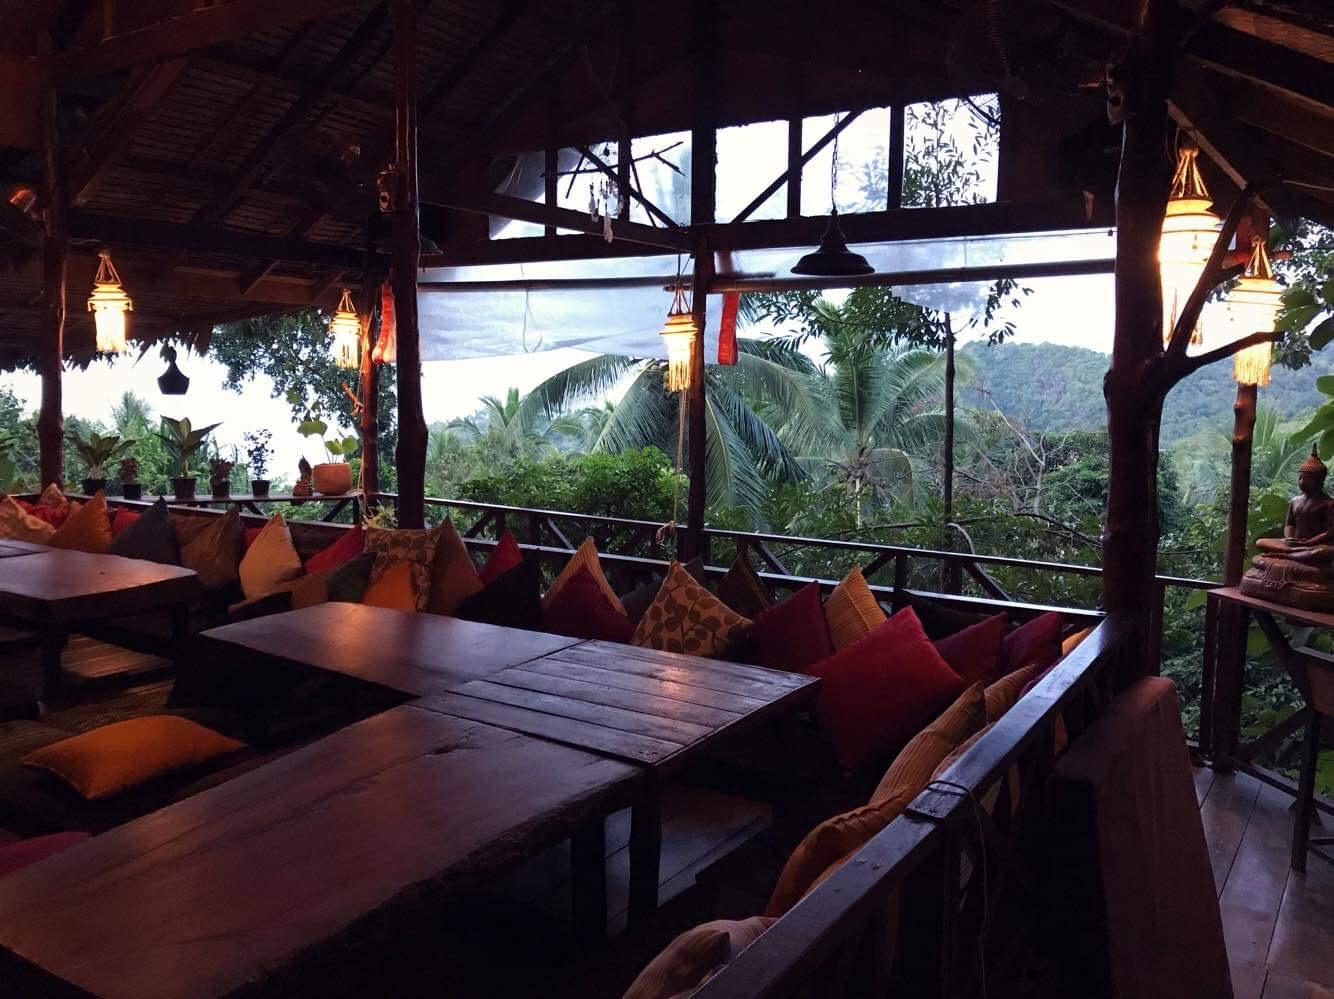 pyramid-restaurant-evening-setting.JPG